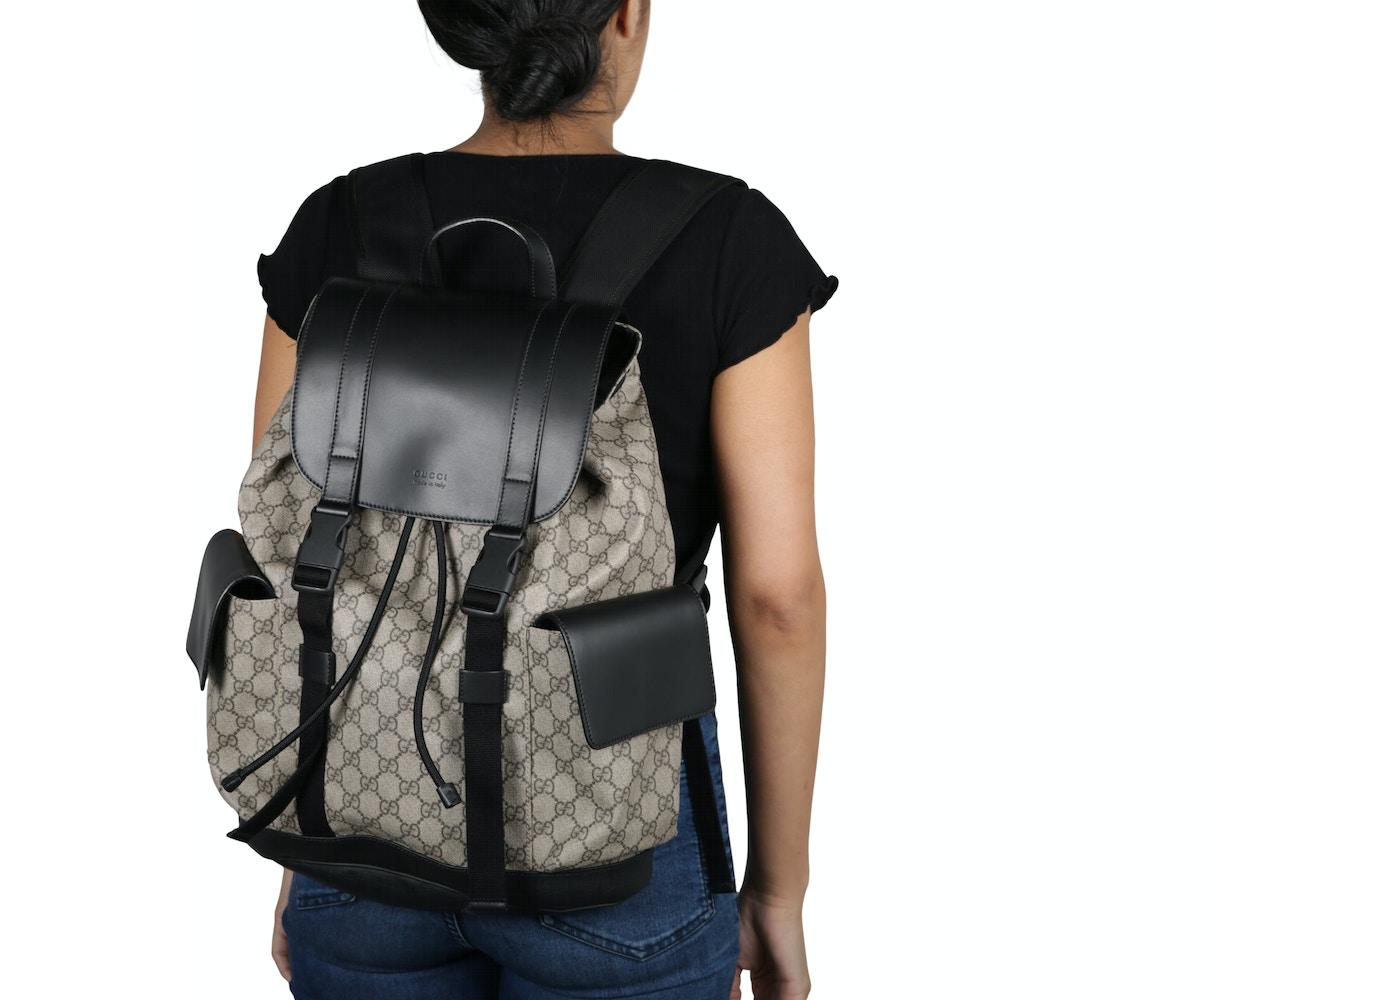 44e70a80461 Gucci Soft Backpack Monogram GG Black Brown